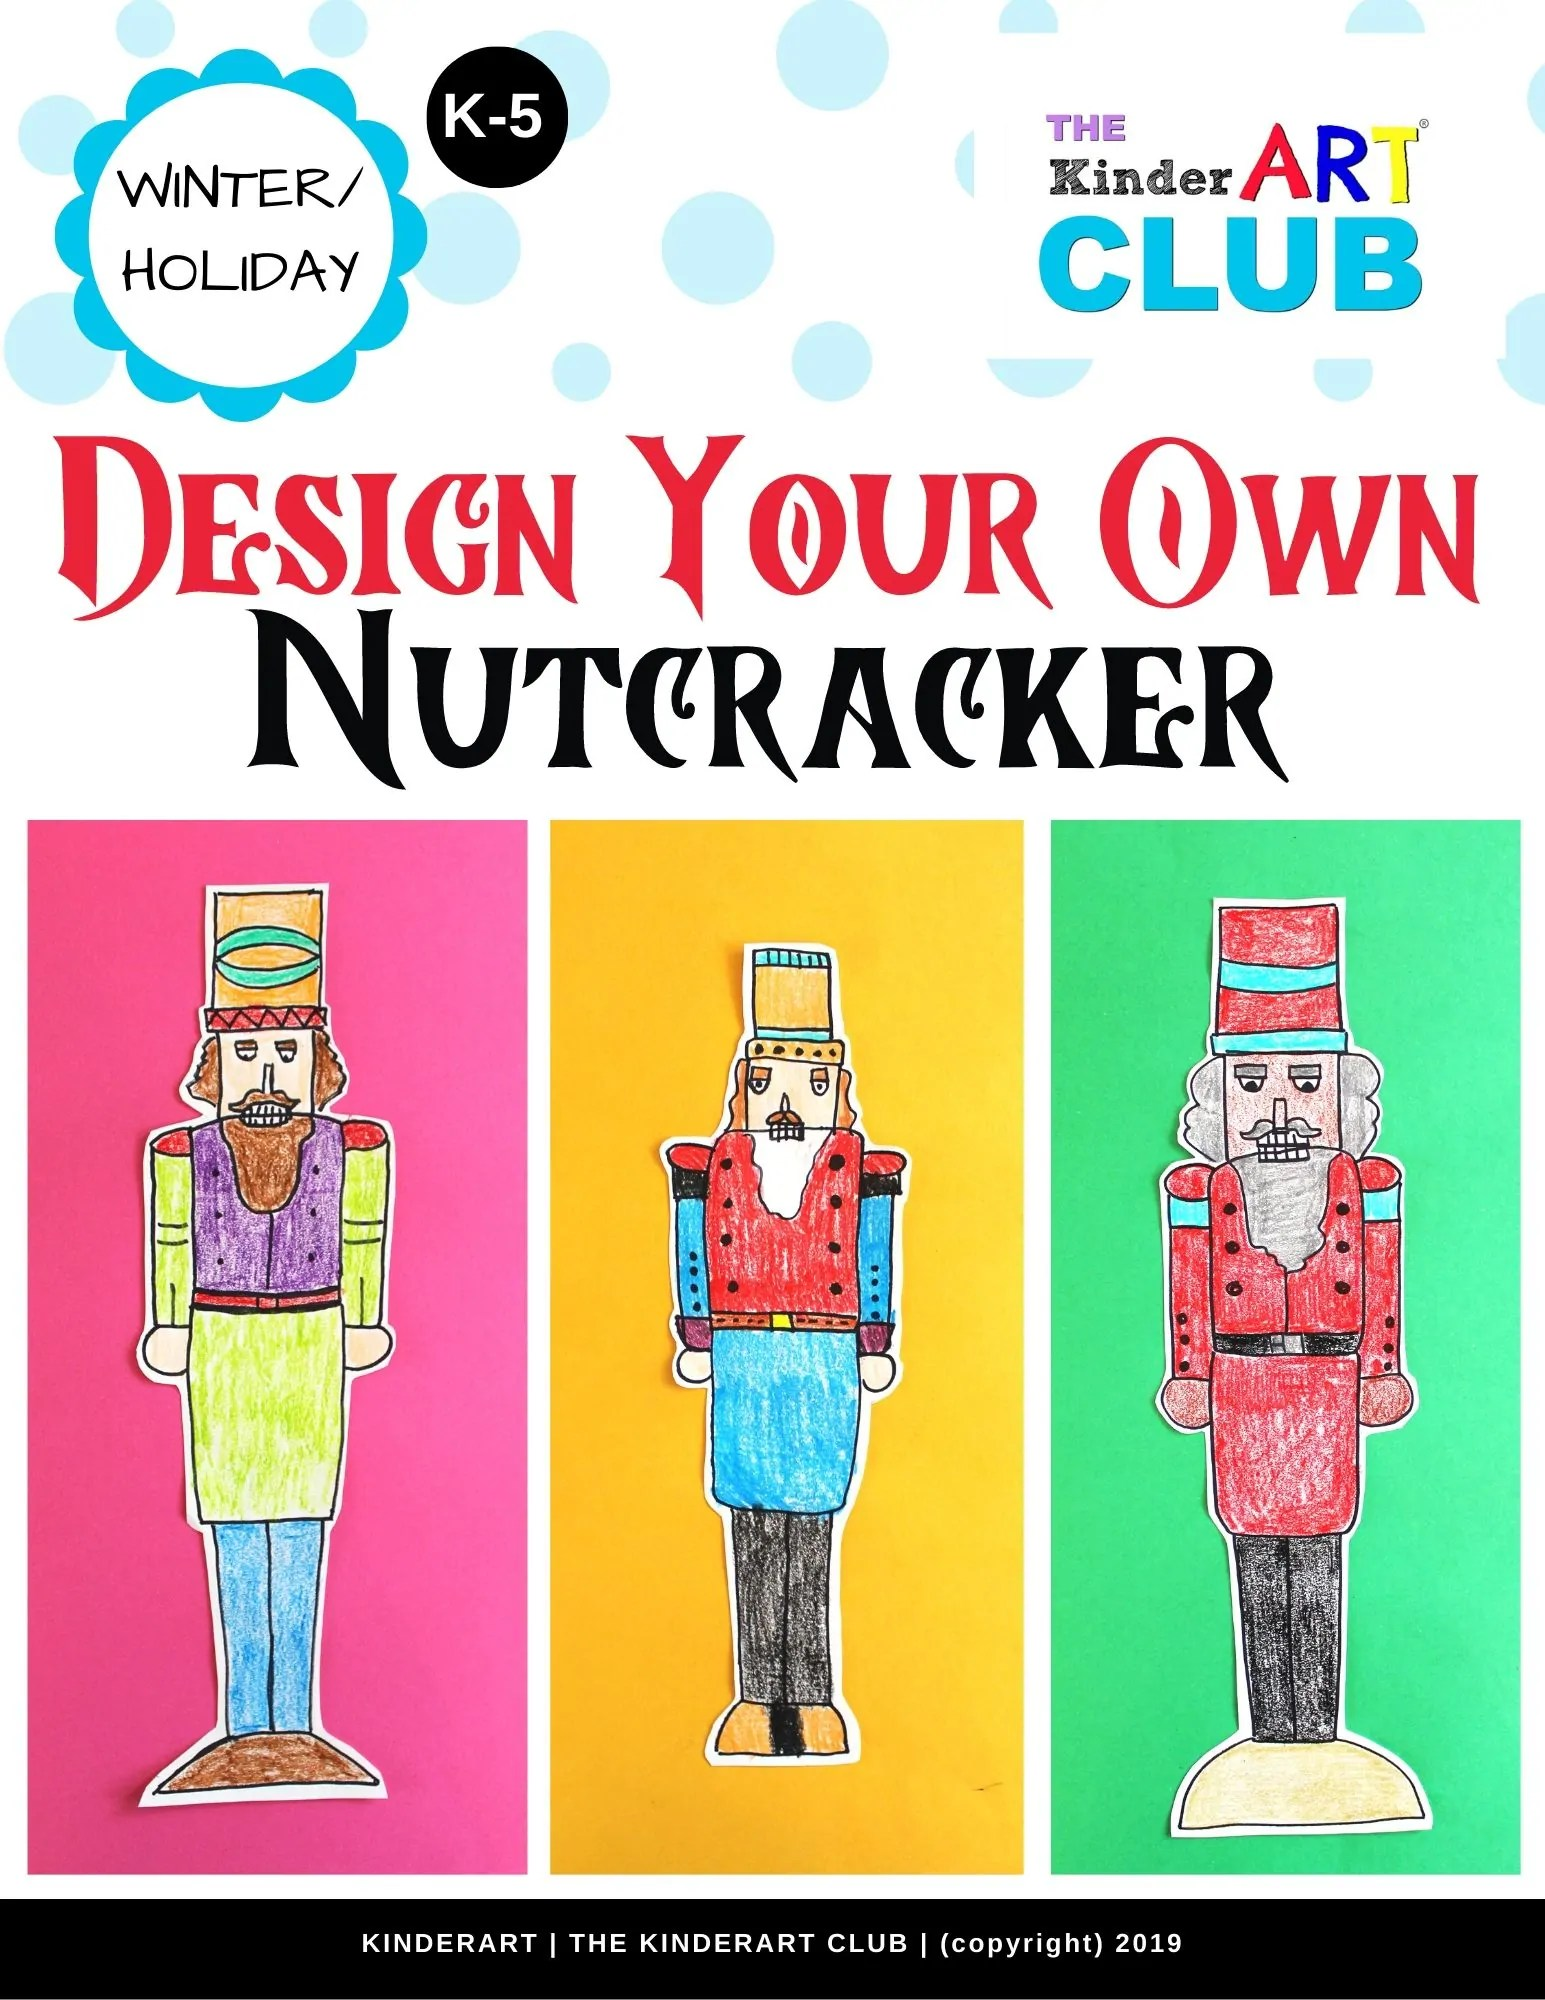 Lesson Design Your Own Nutcracker